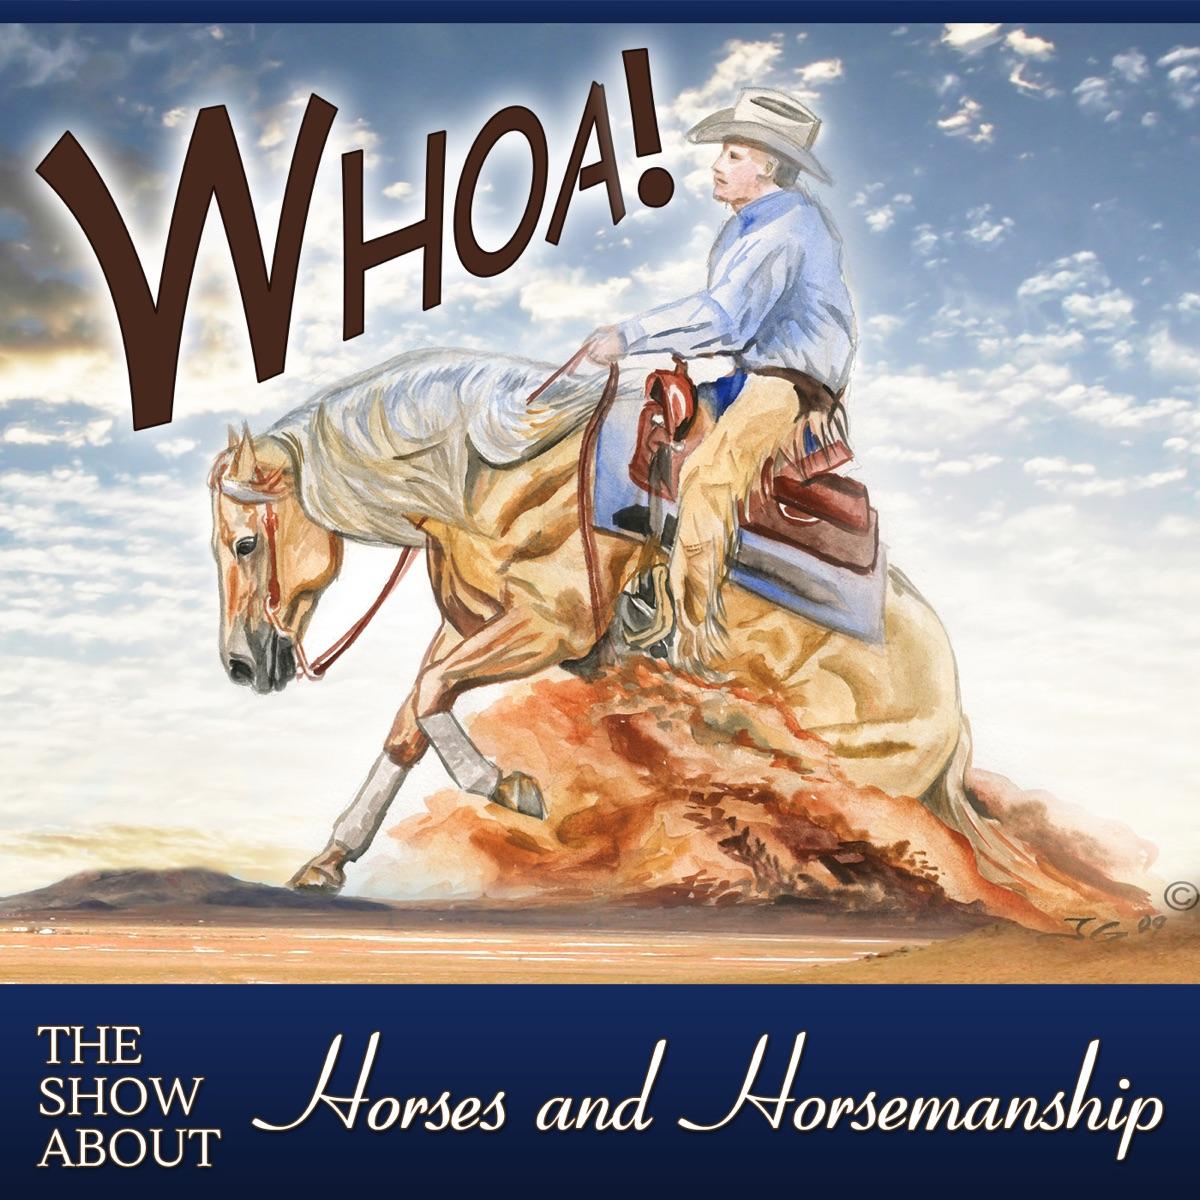 Whoa Podcast About Horses Horsemanship